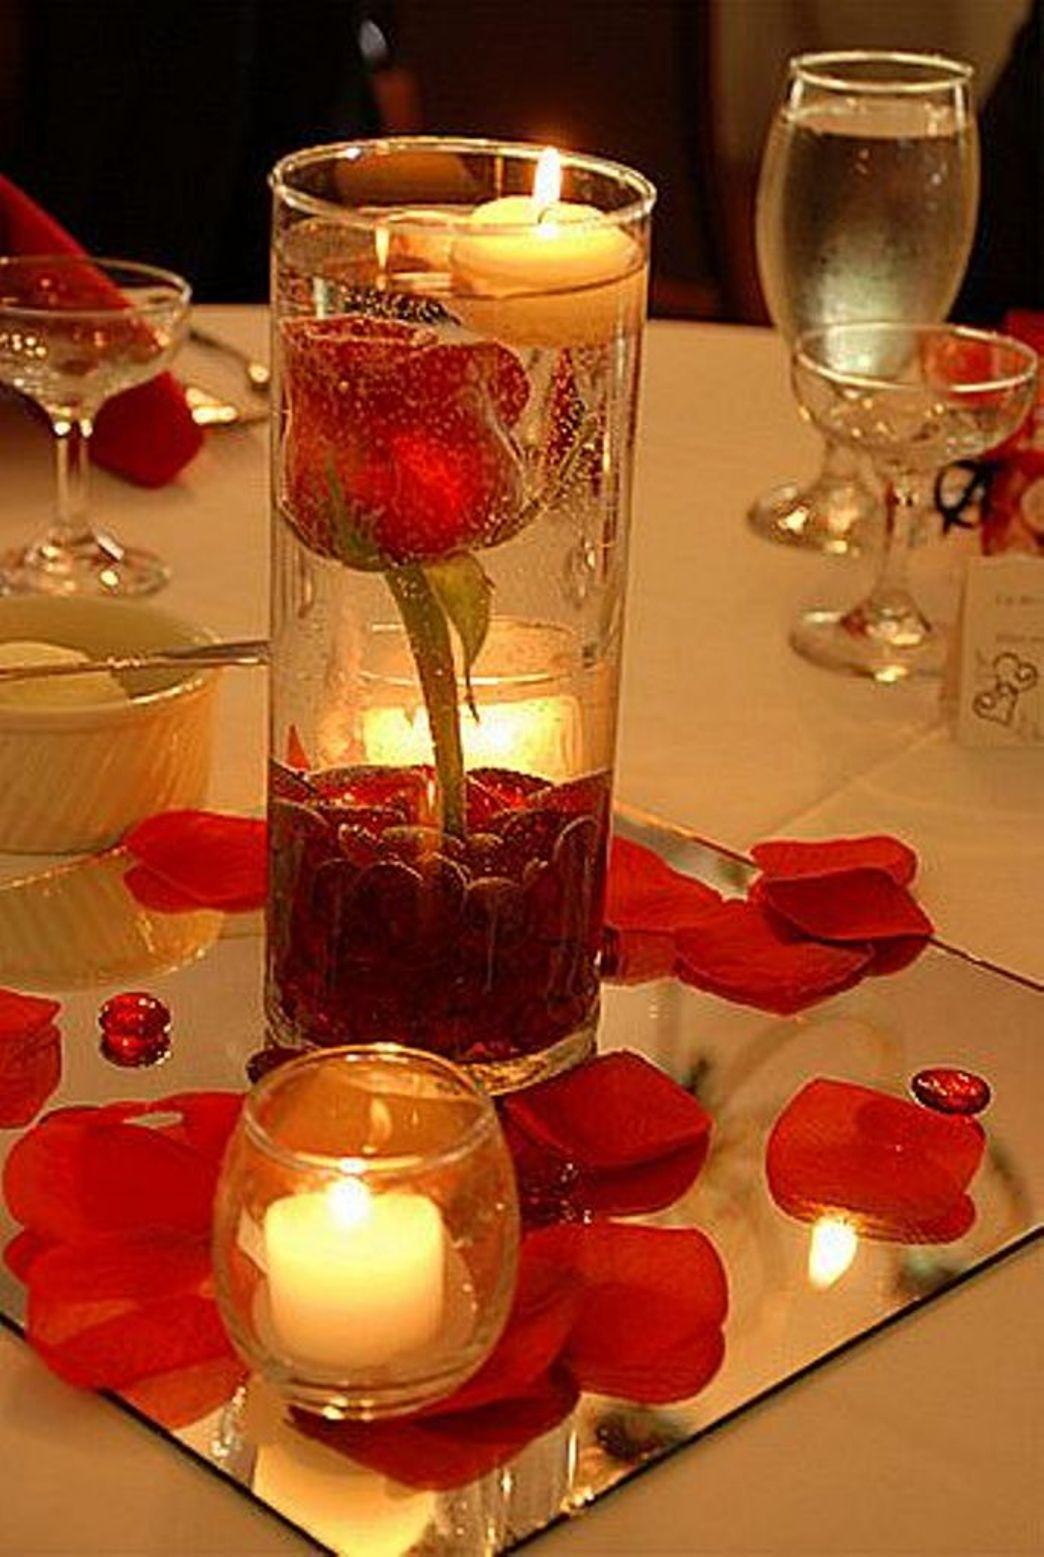 wedding-centerpiece-ideas Wonderful ideas for decorating your wedding